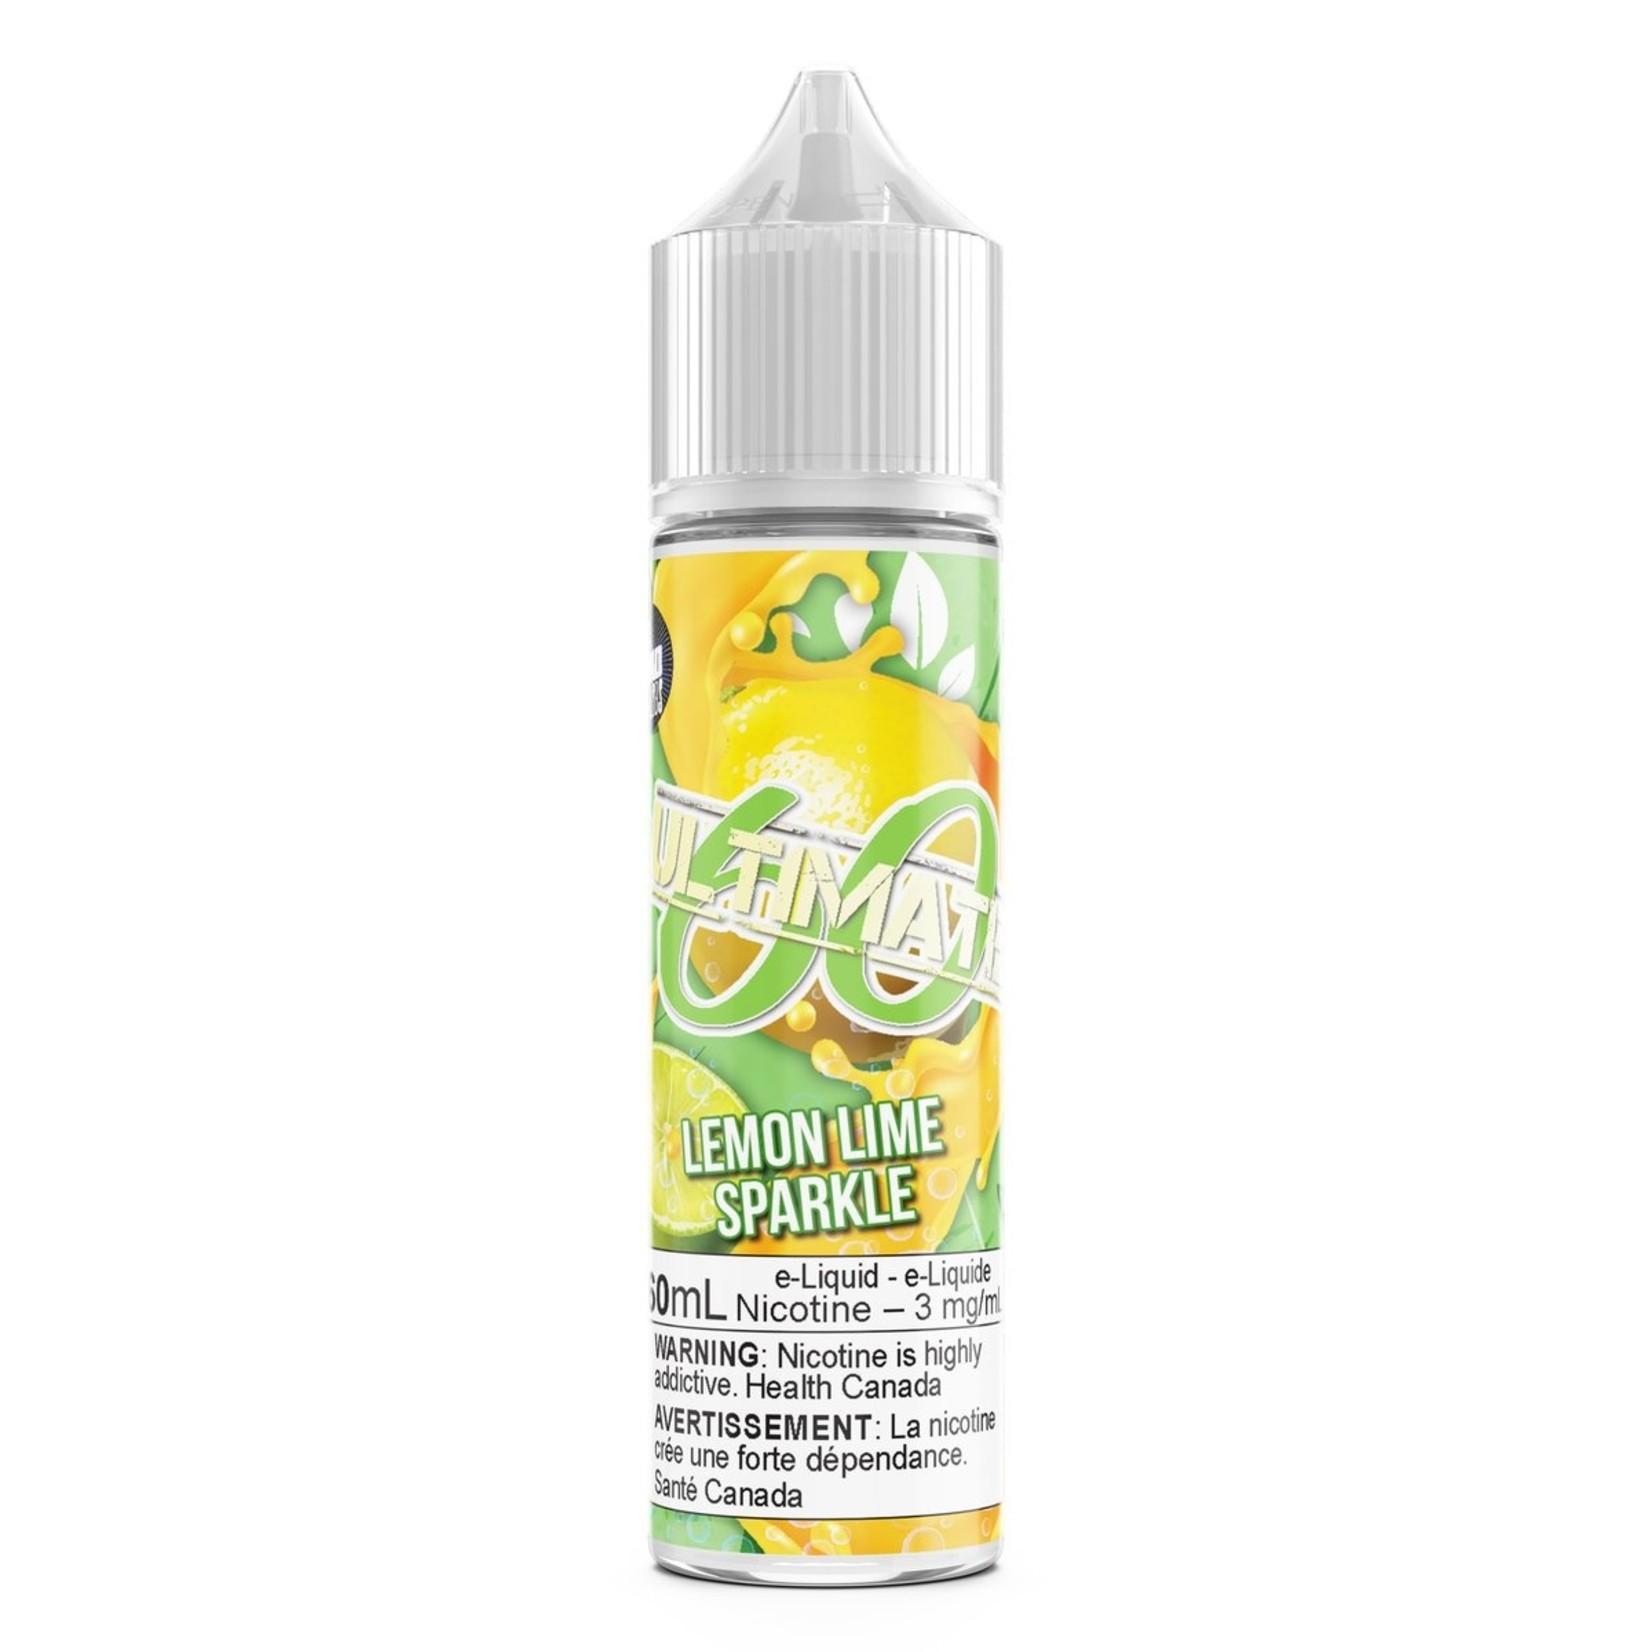 Ultimate 60 Lemon Lime Sparkle